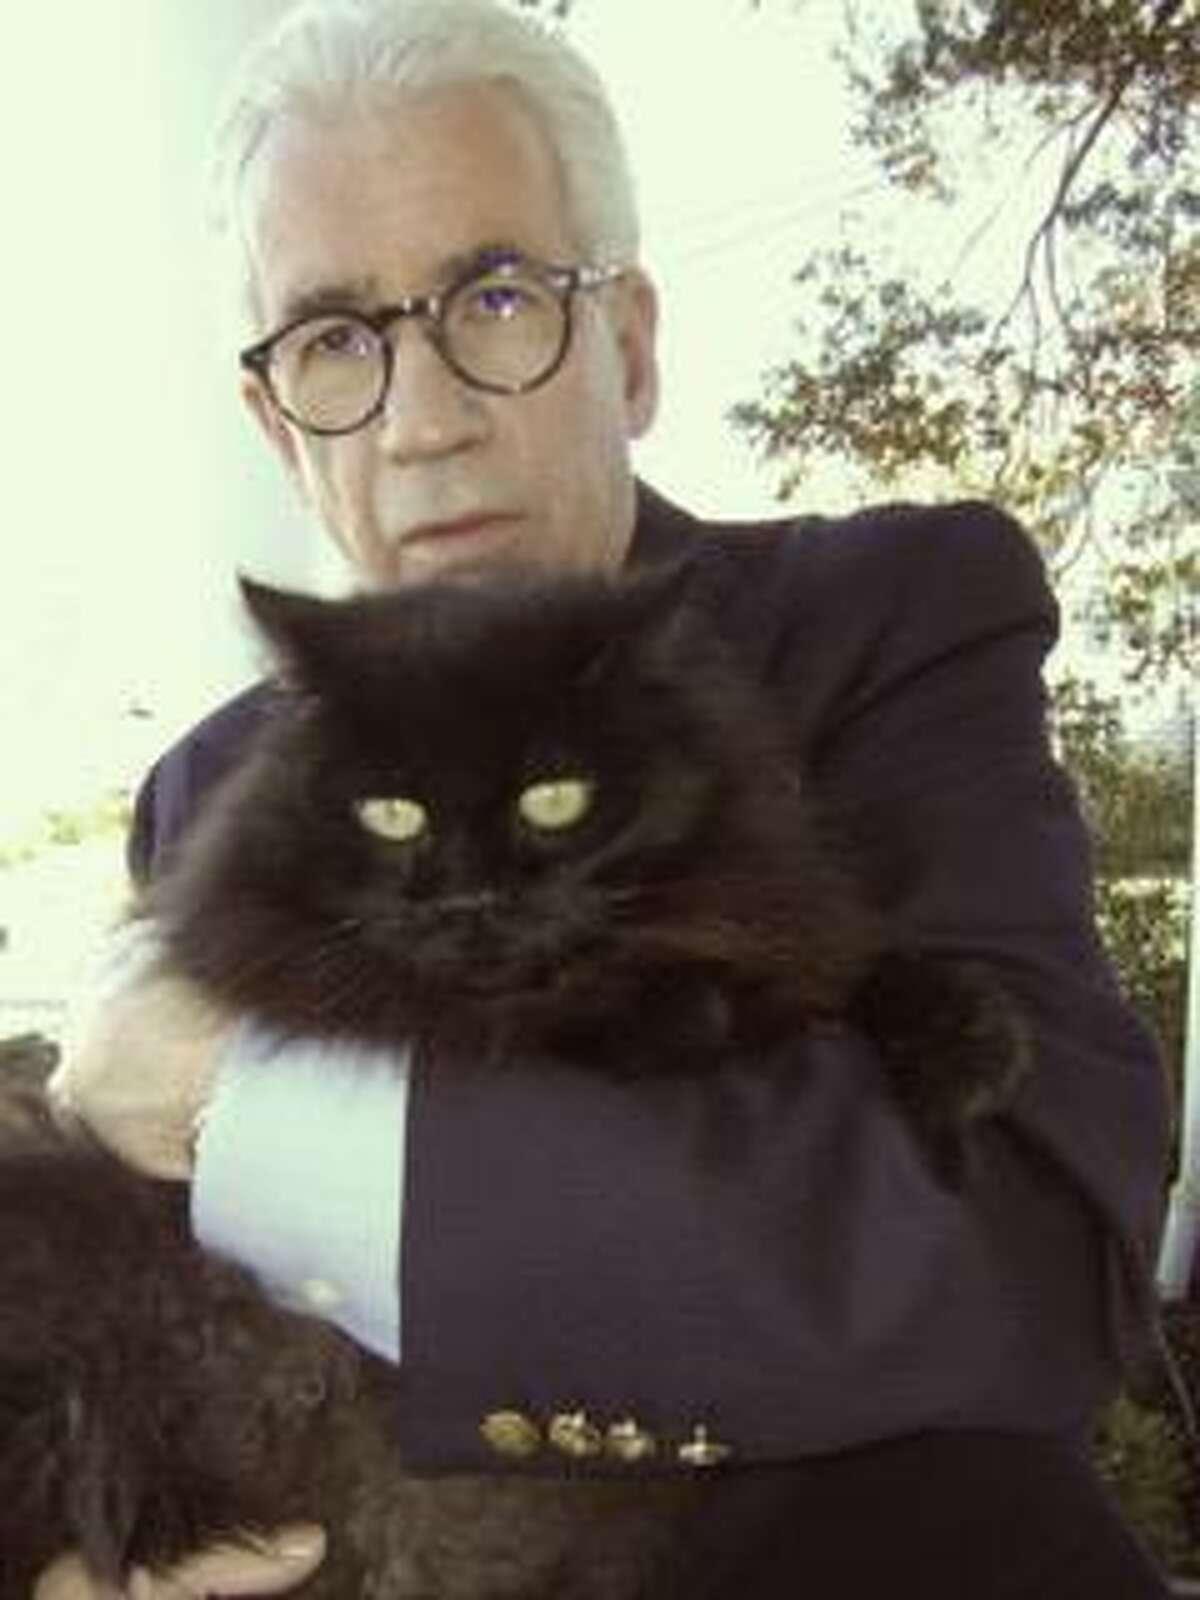 Joe Saunders and his cat, Boo.